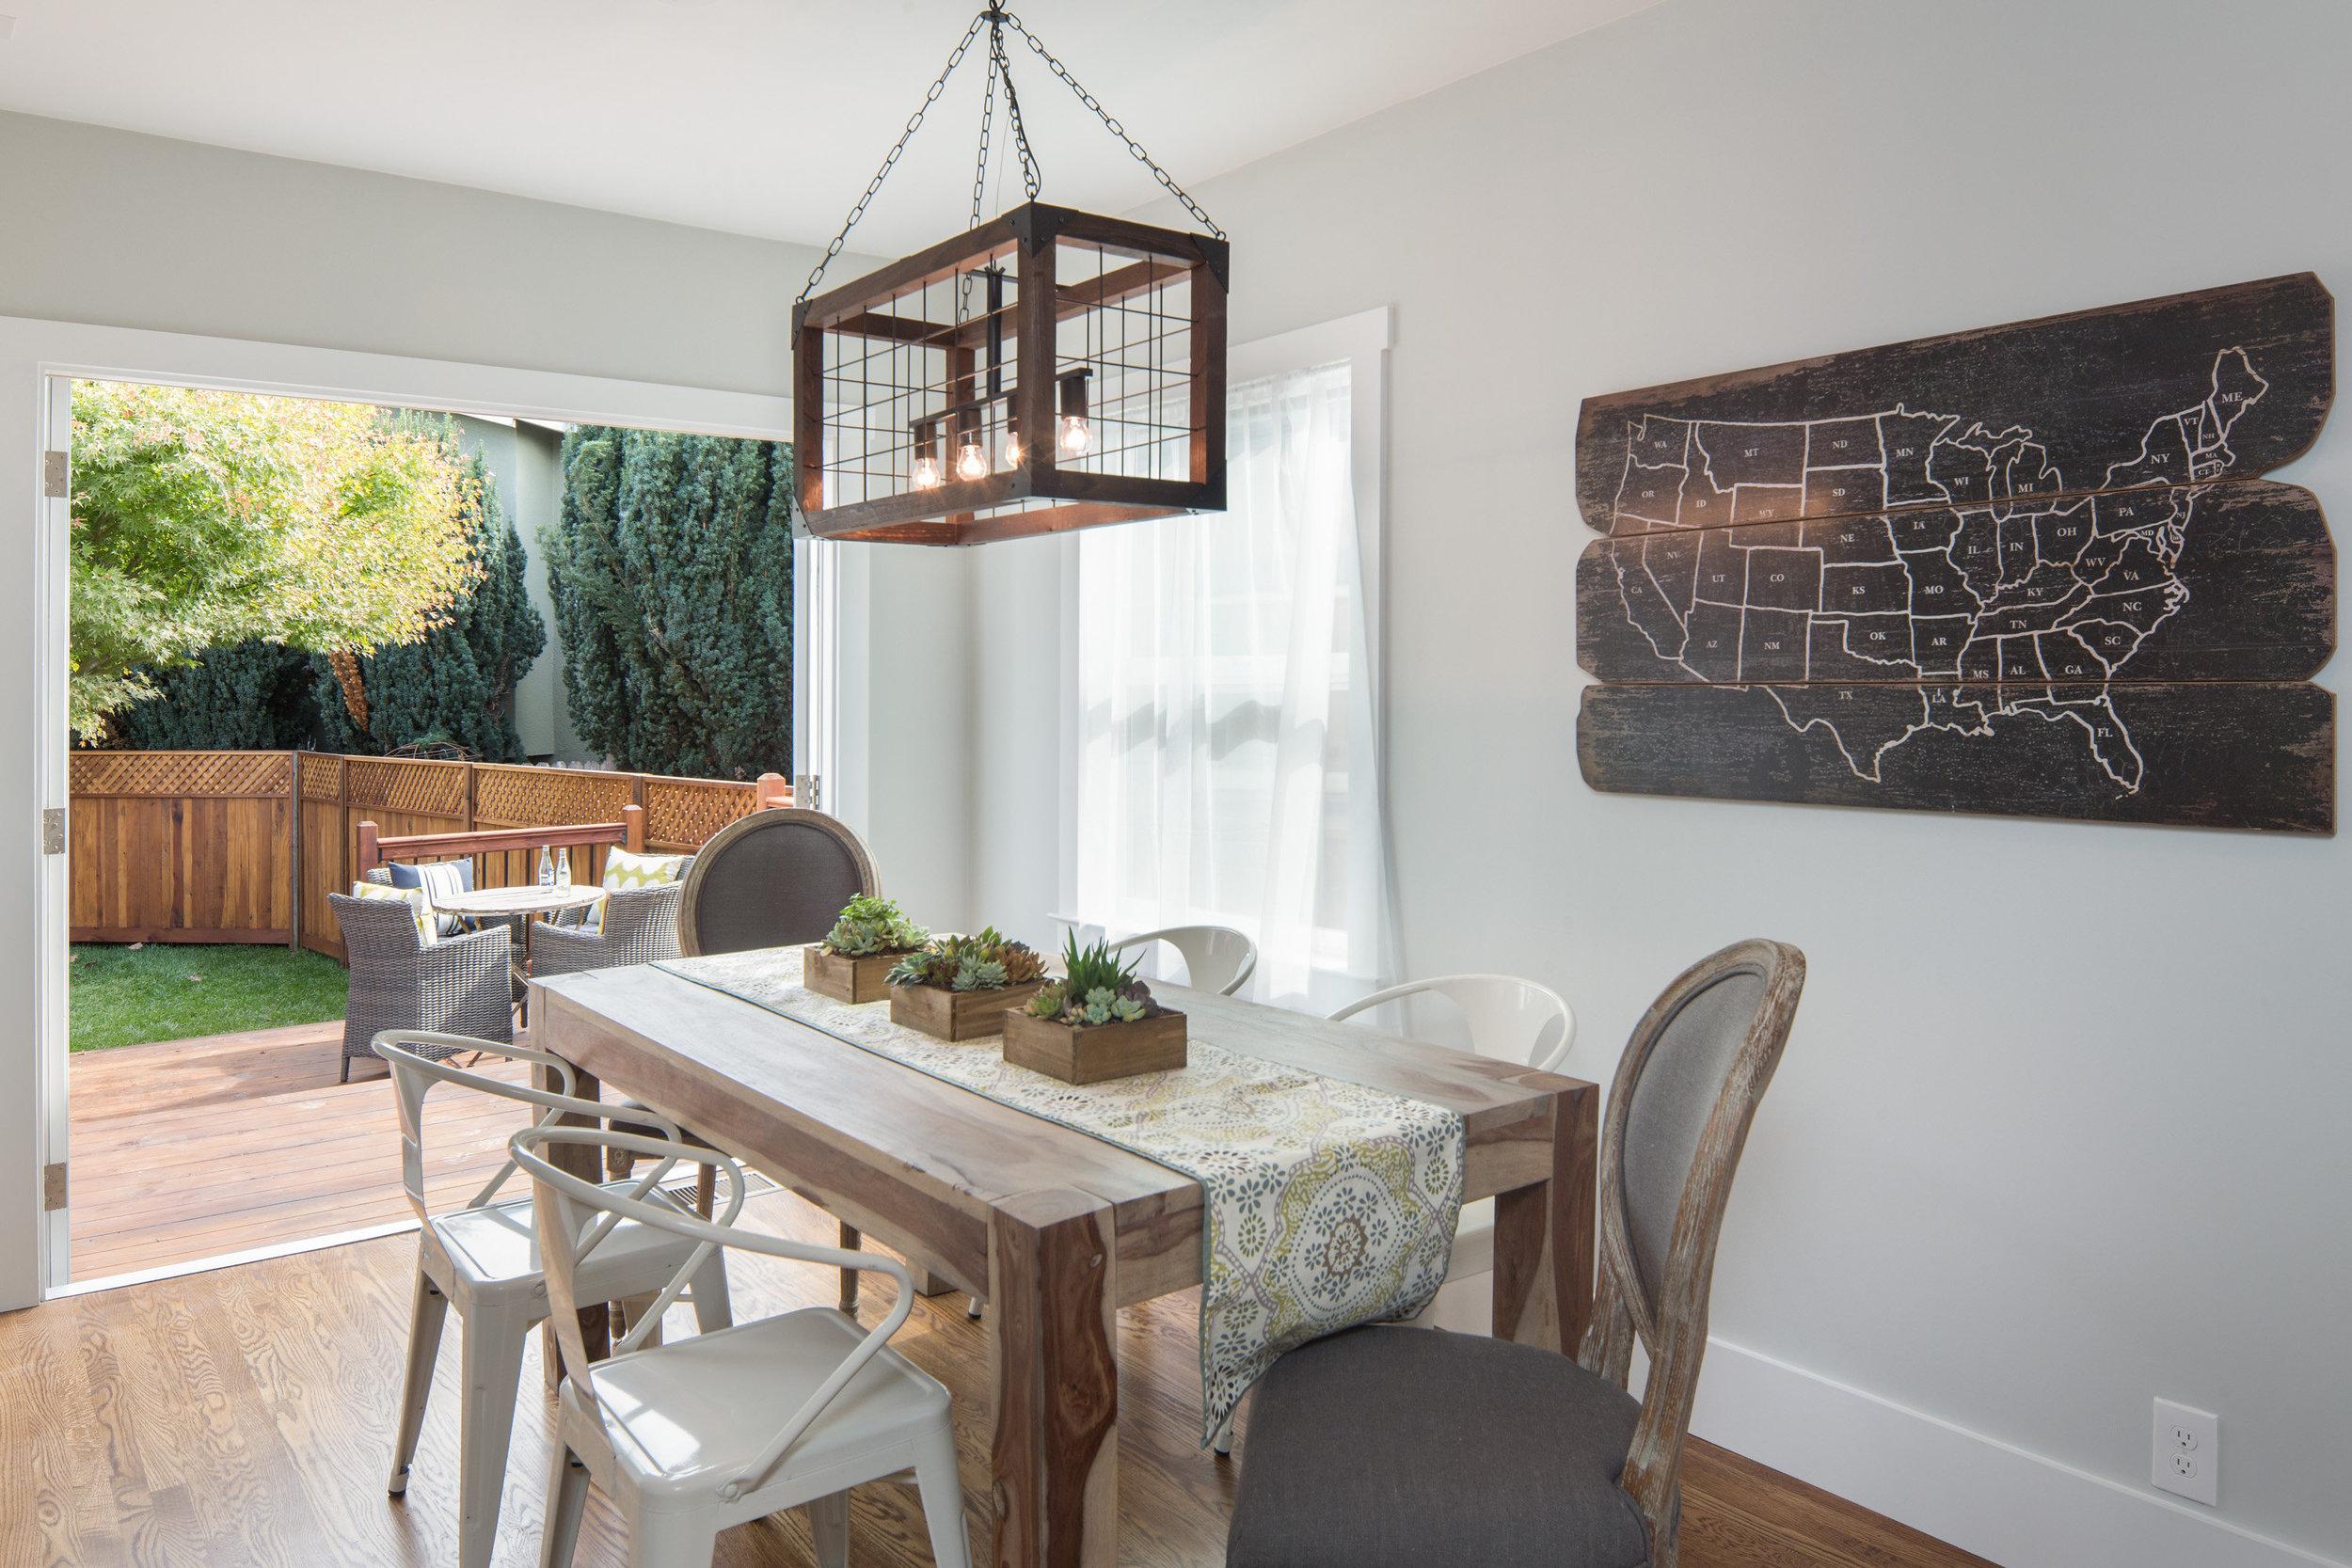 Rockridge, Oakland CA 94618 Napa FarmHouse for Sale